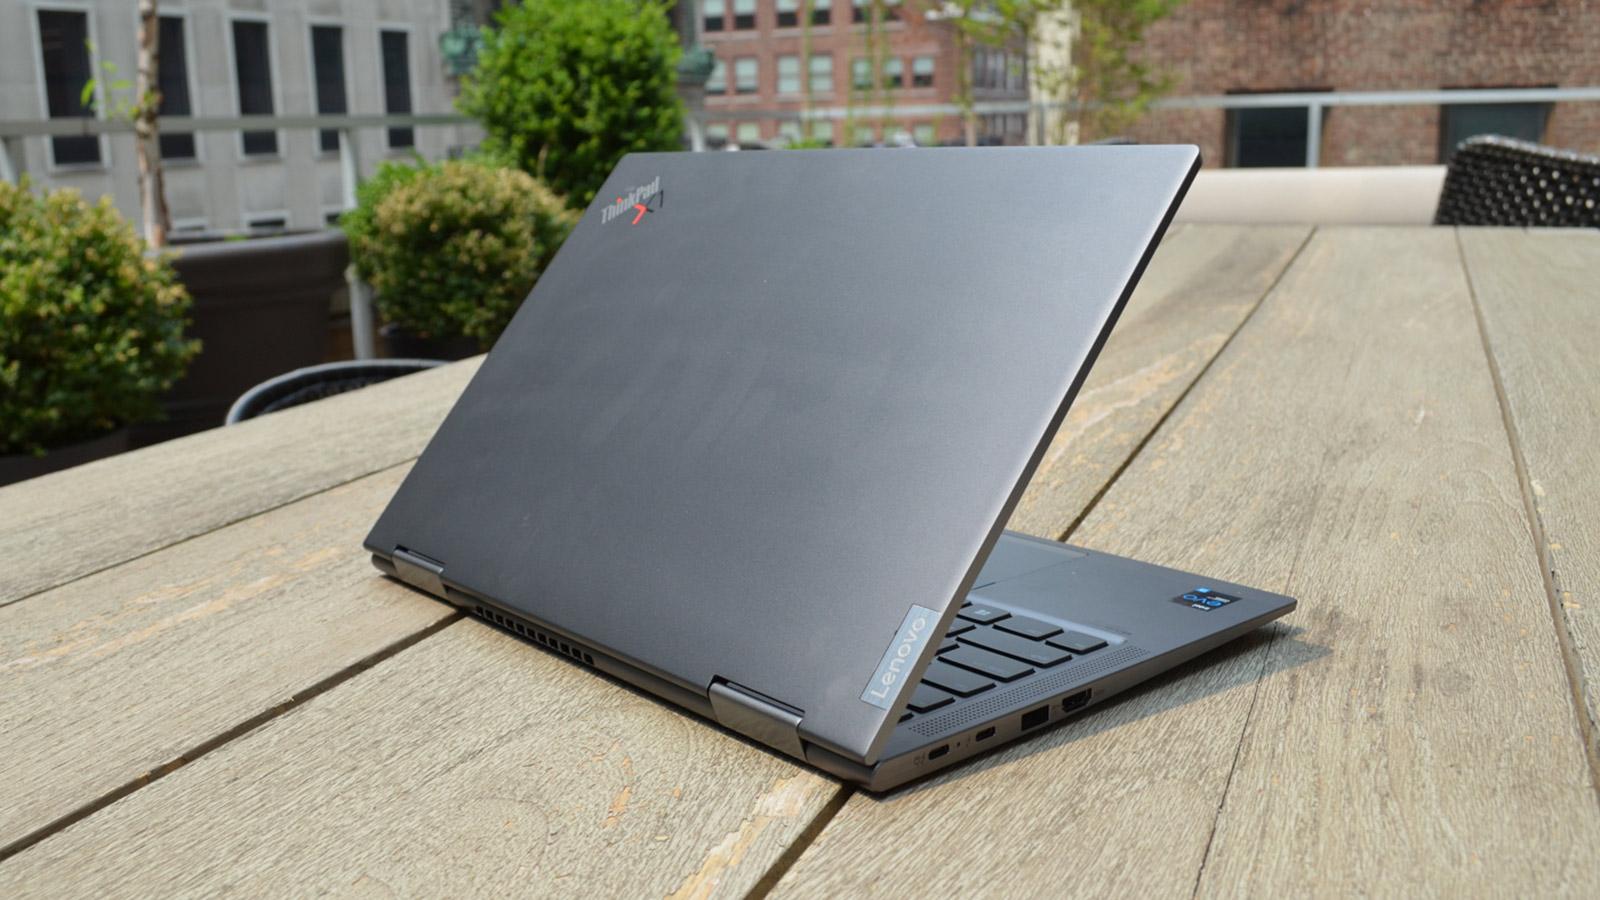 Lenovo ThinkPad X1 Yoga Gen 6 Lid Half-Opened